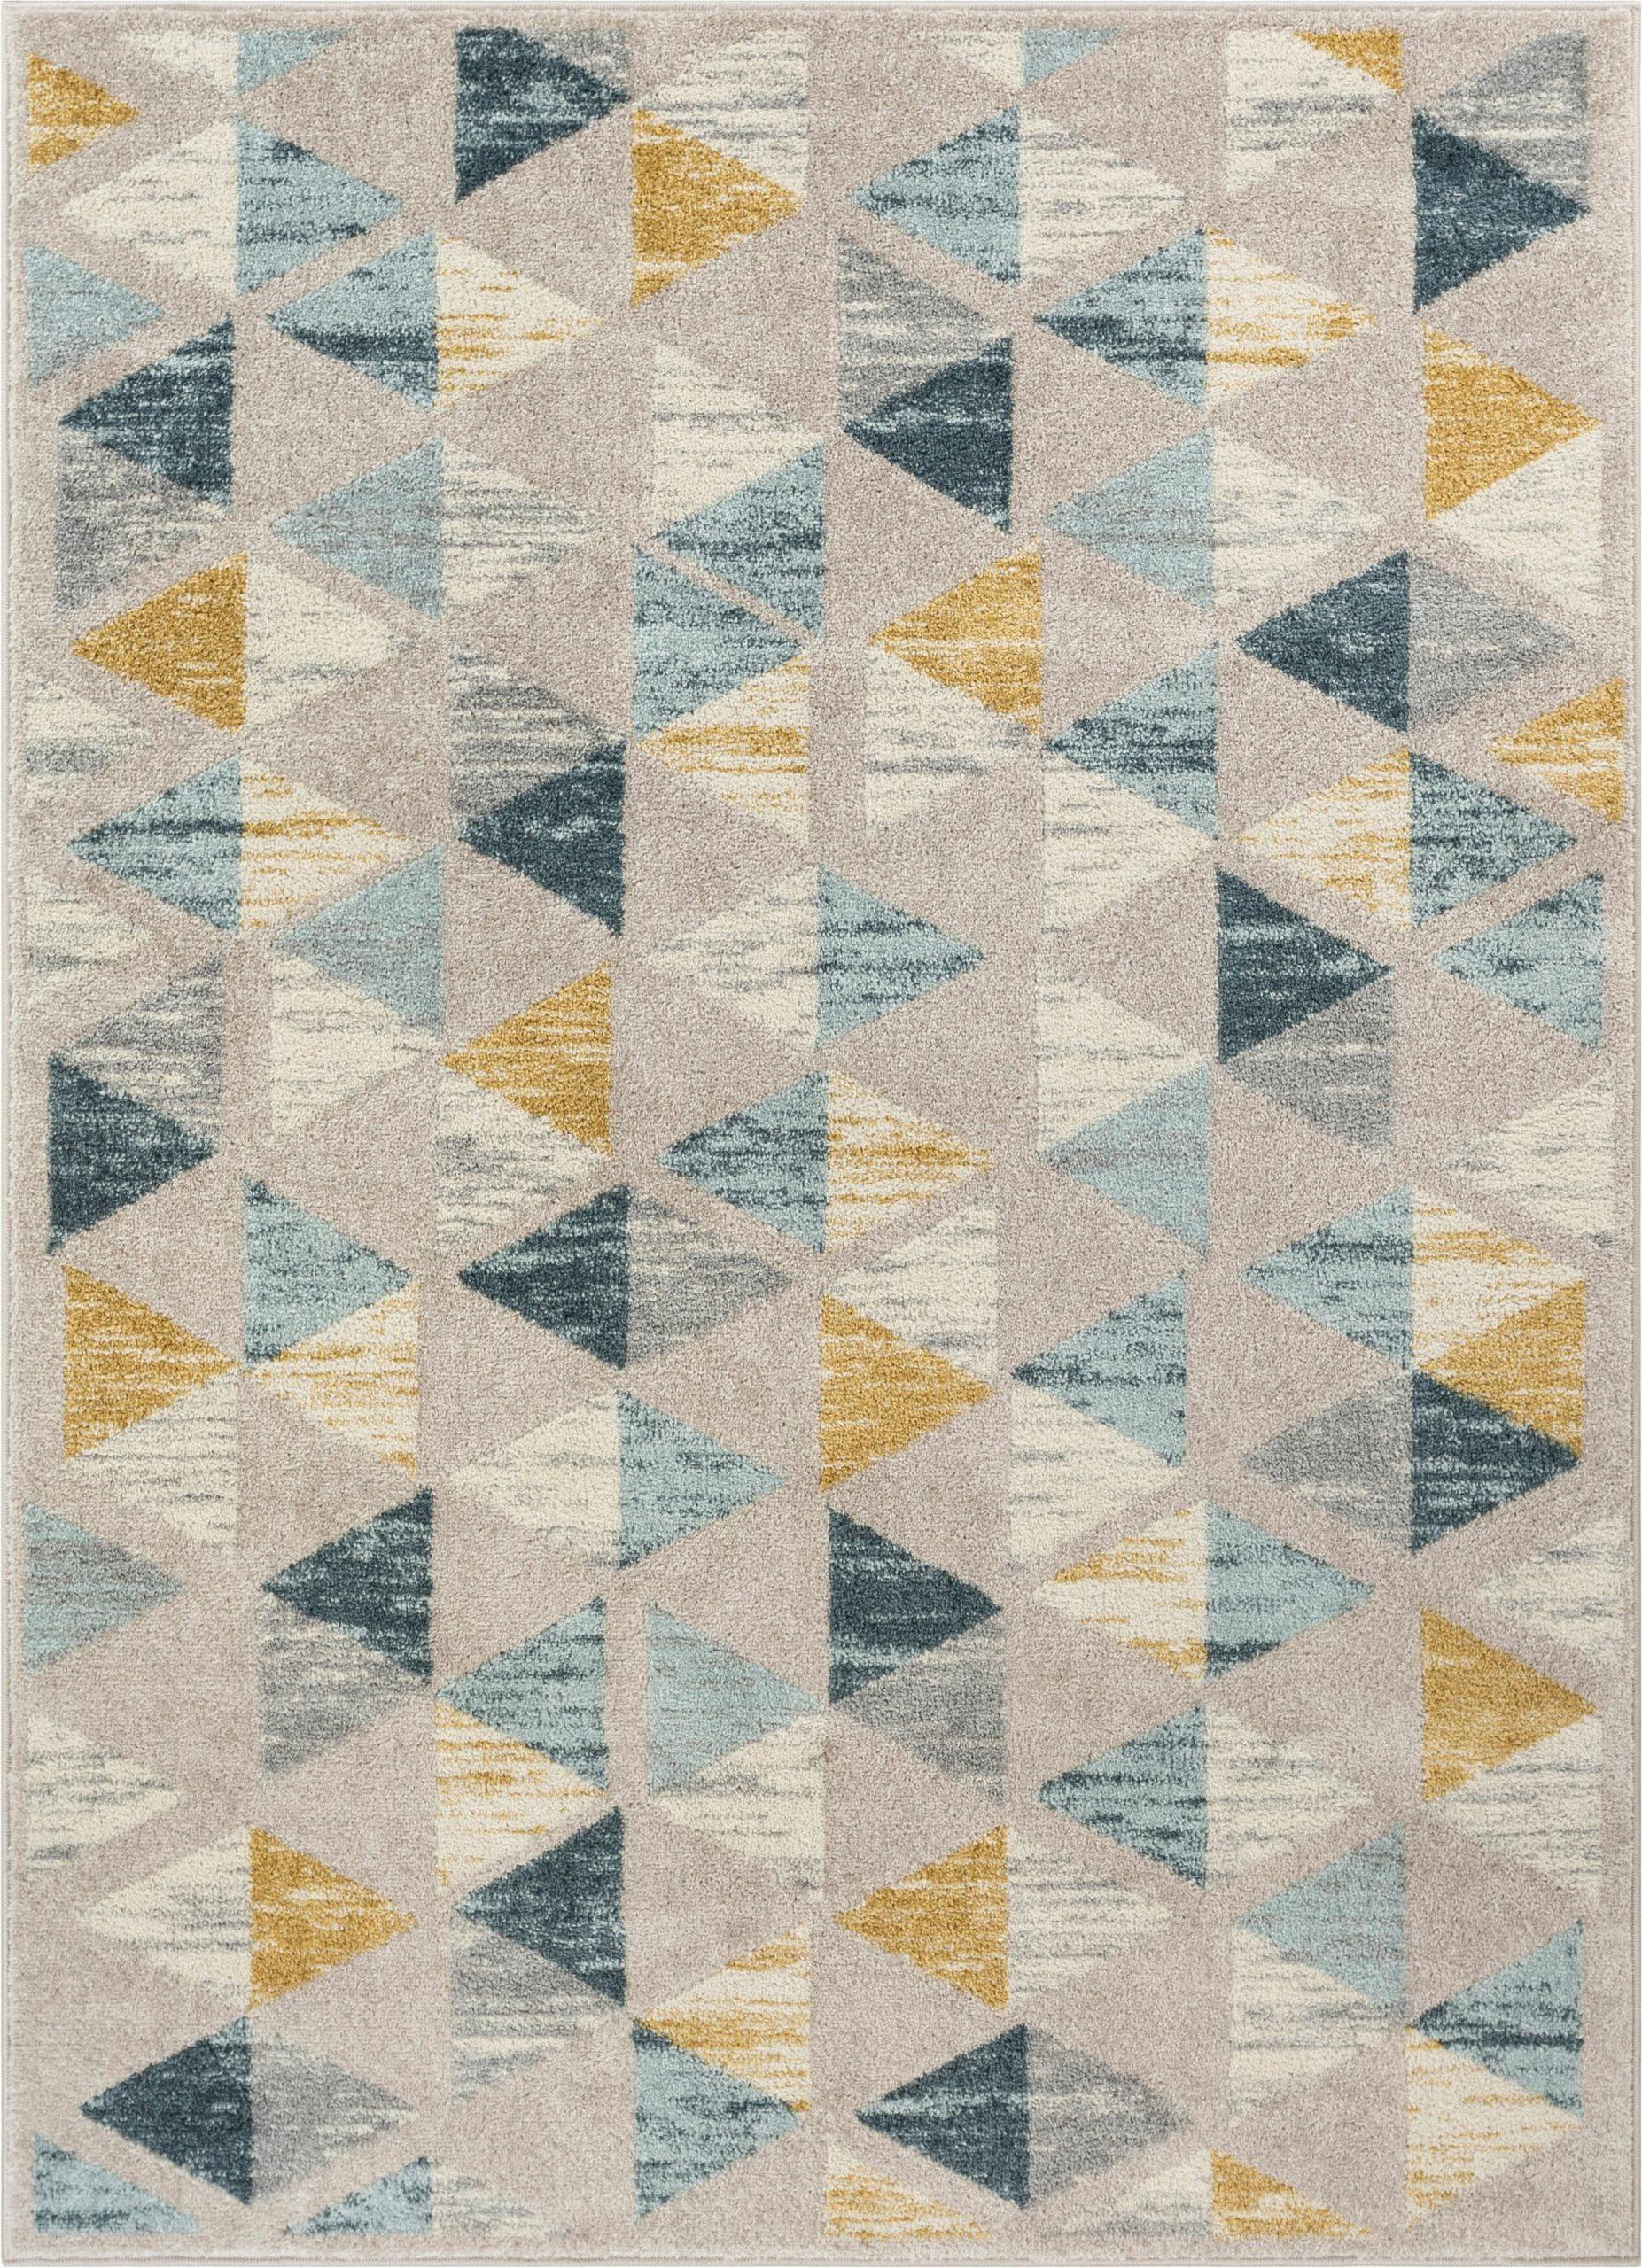 mystic modern vintage geometric ivoryteal area rug